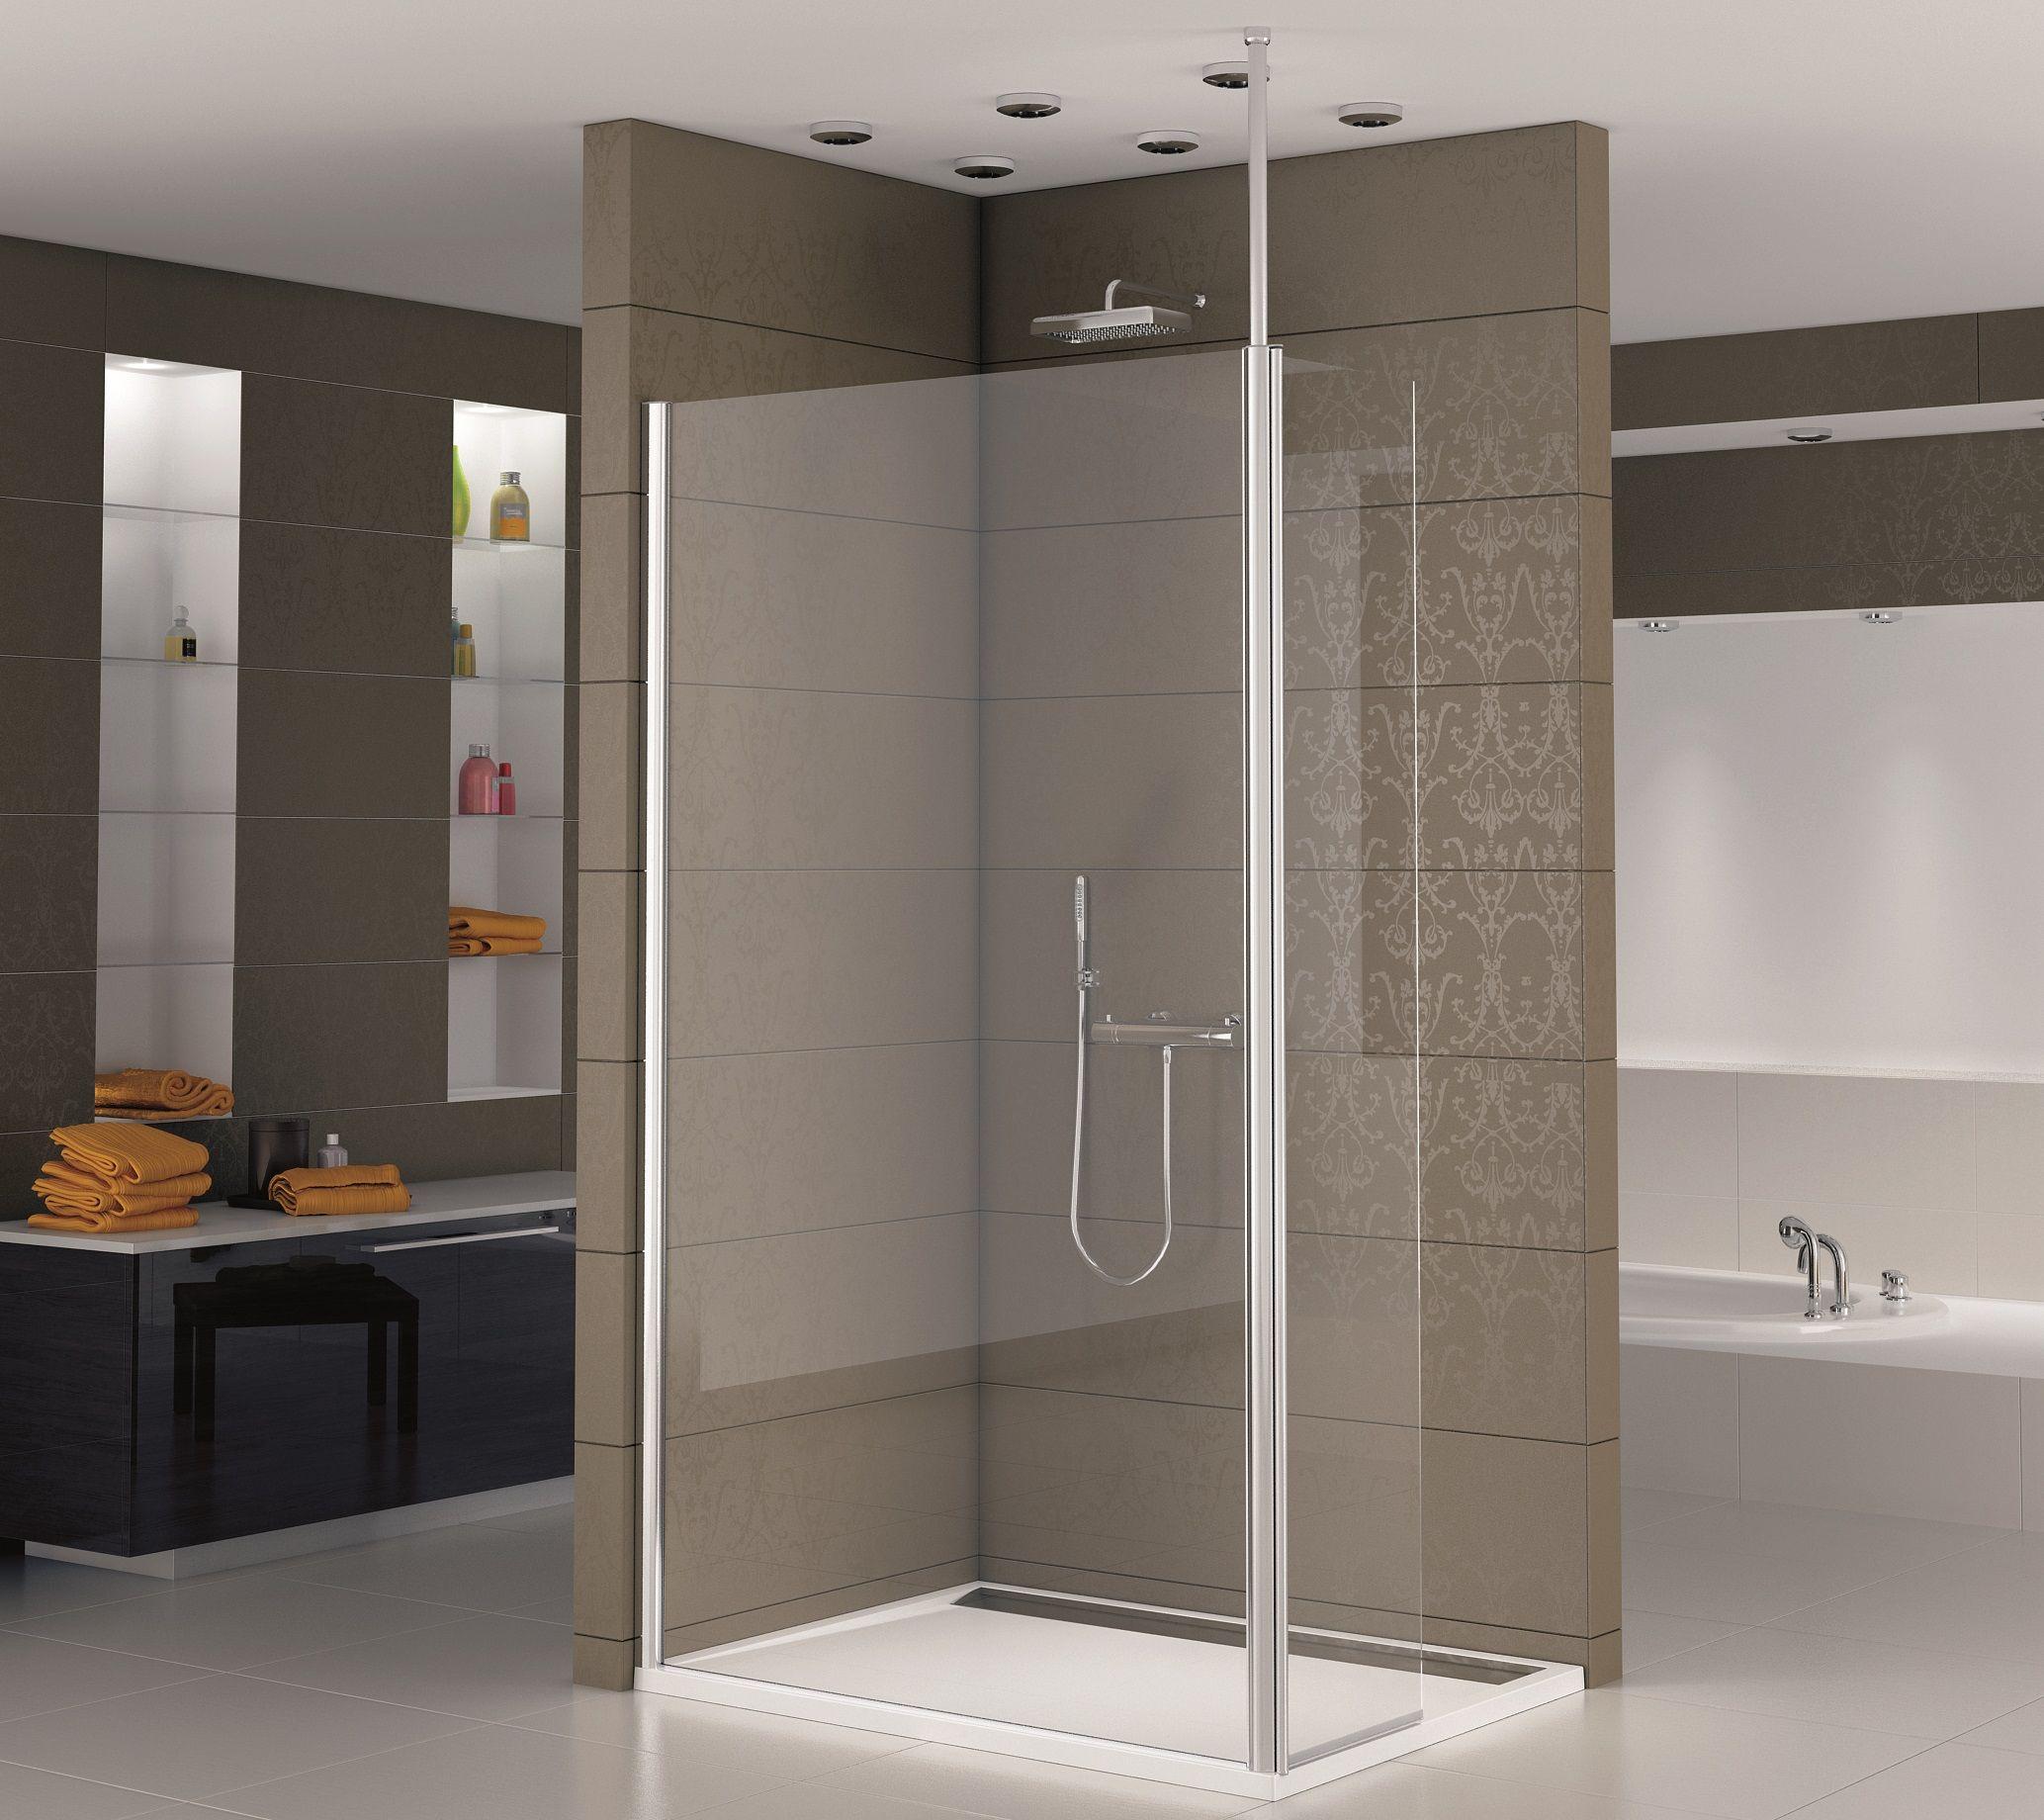 dusche glaswand Wobaki Design Glaswand Dusche 120 x